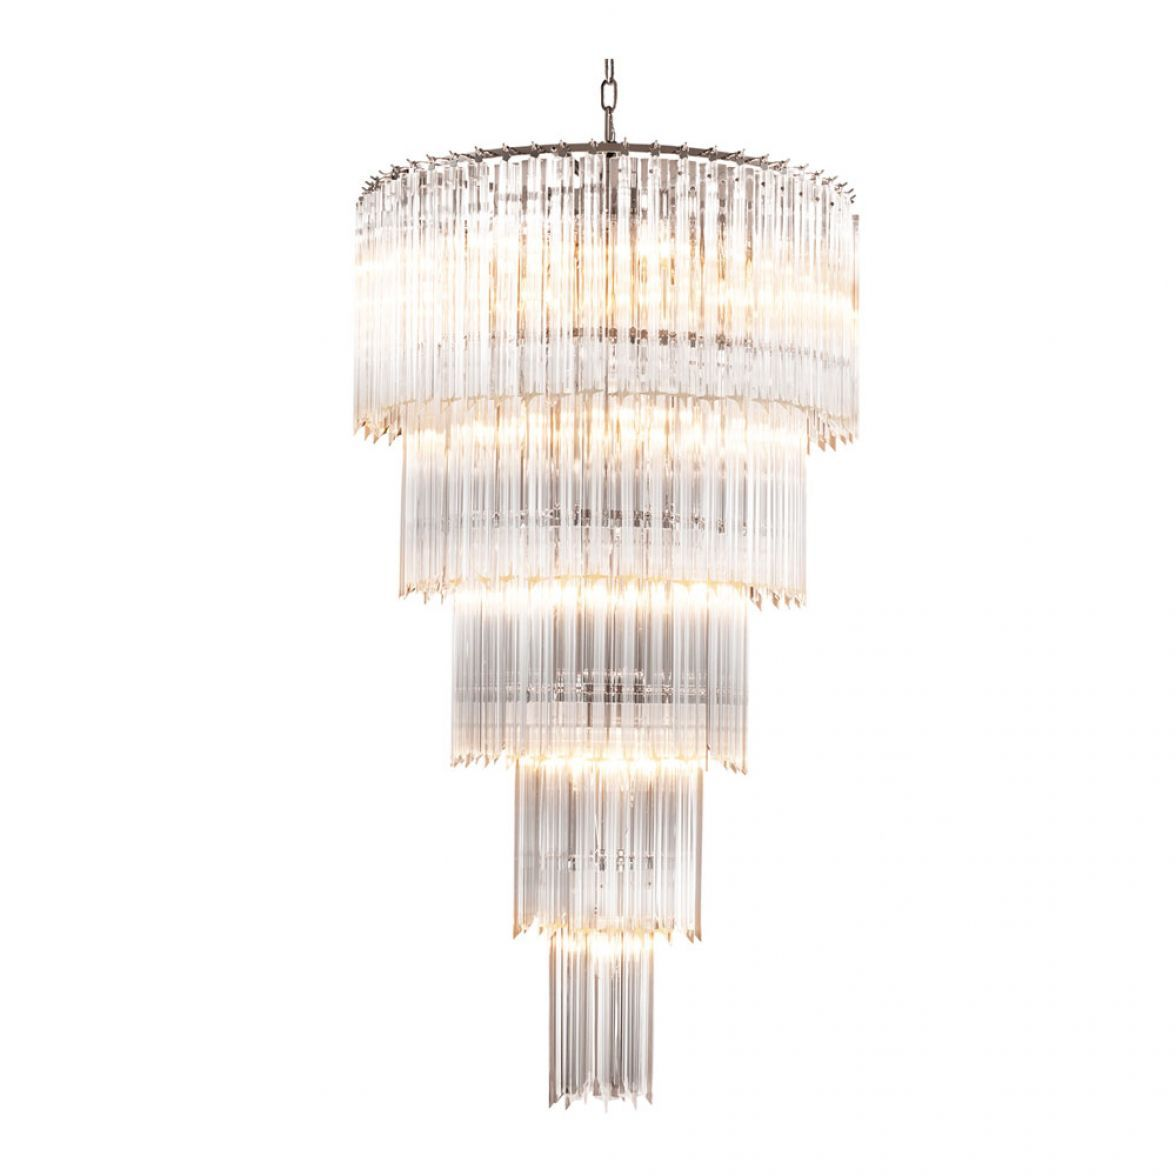 Alpina chandelier L фото цена